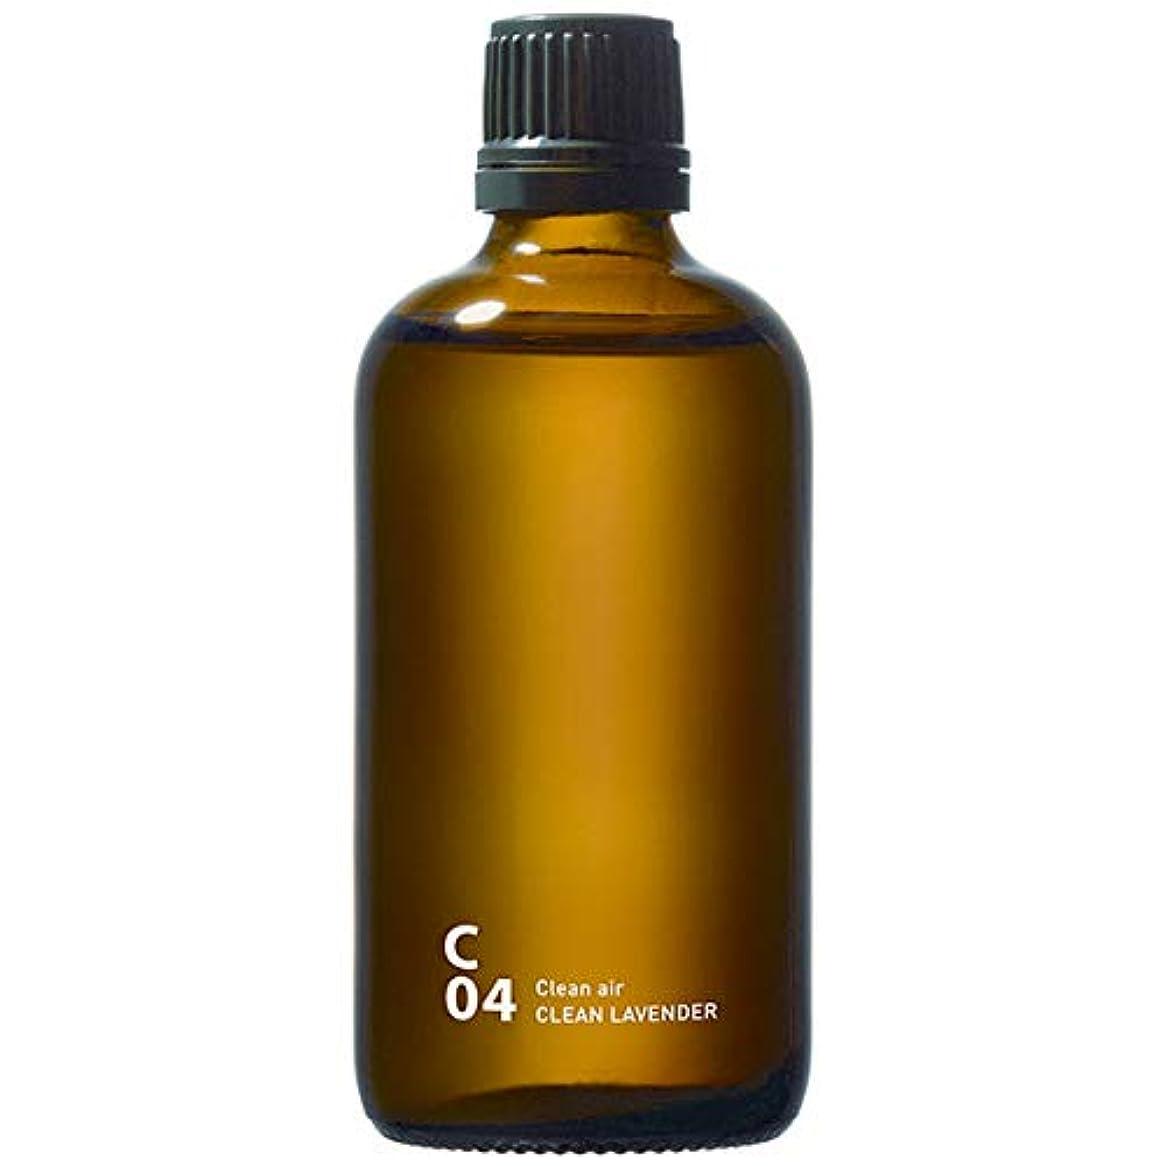 破壊する社会主義社会主義C04 CLEAN LAVENDER piezo aroma oil 100ml